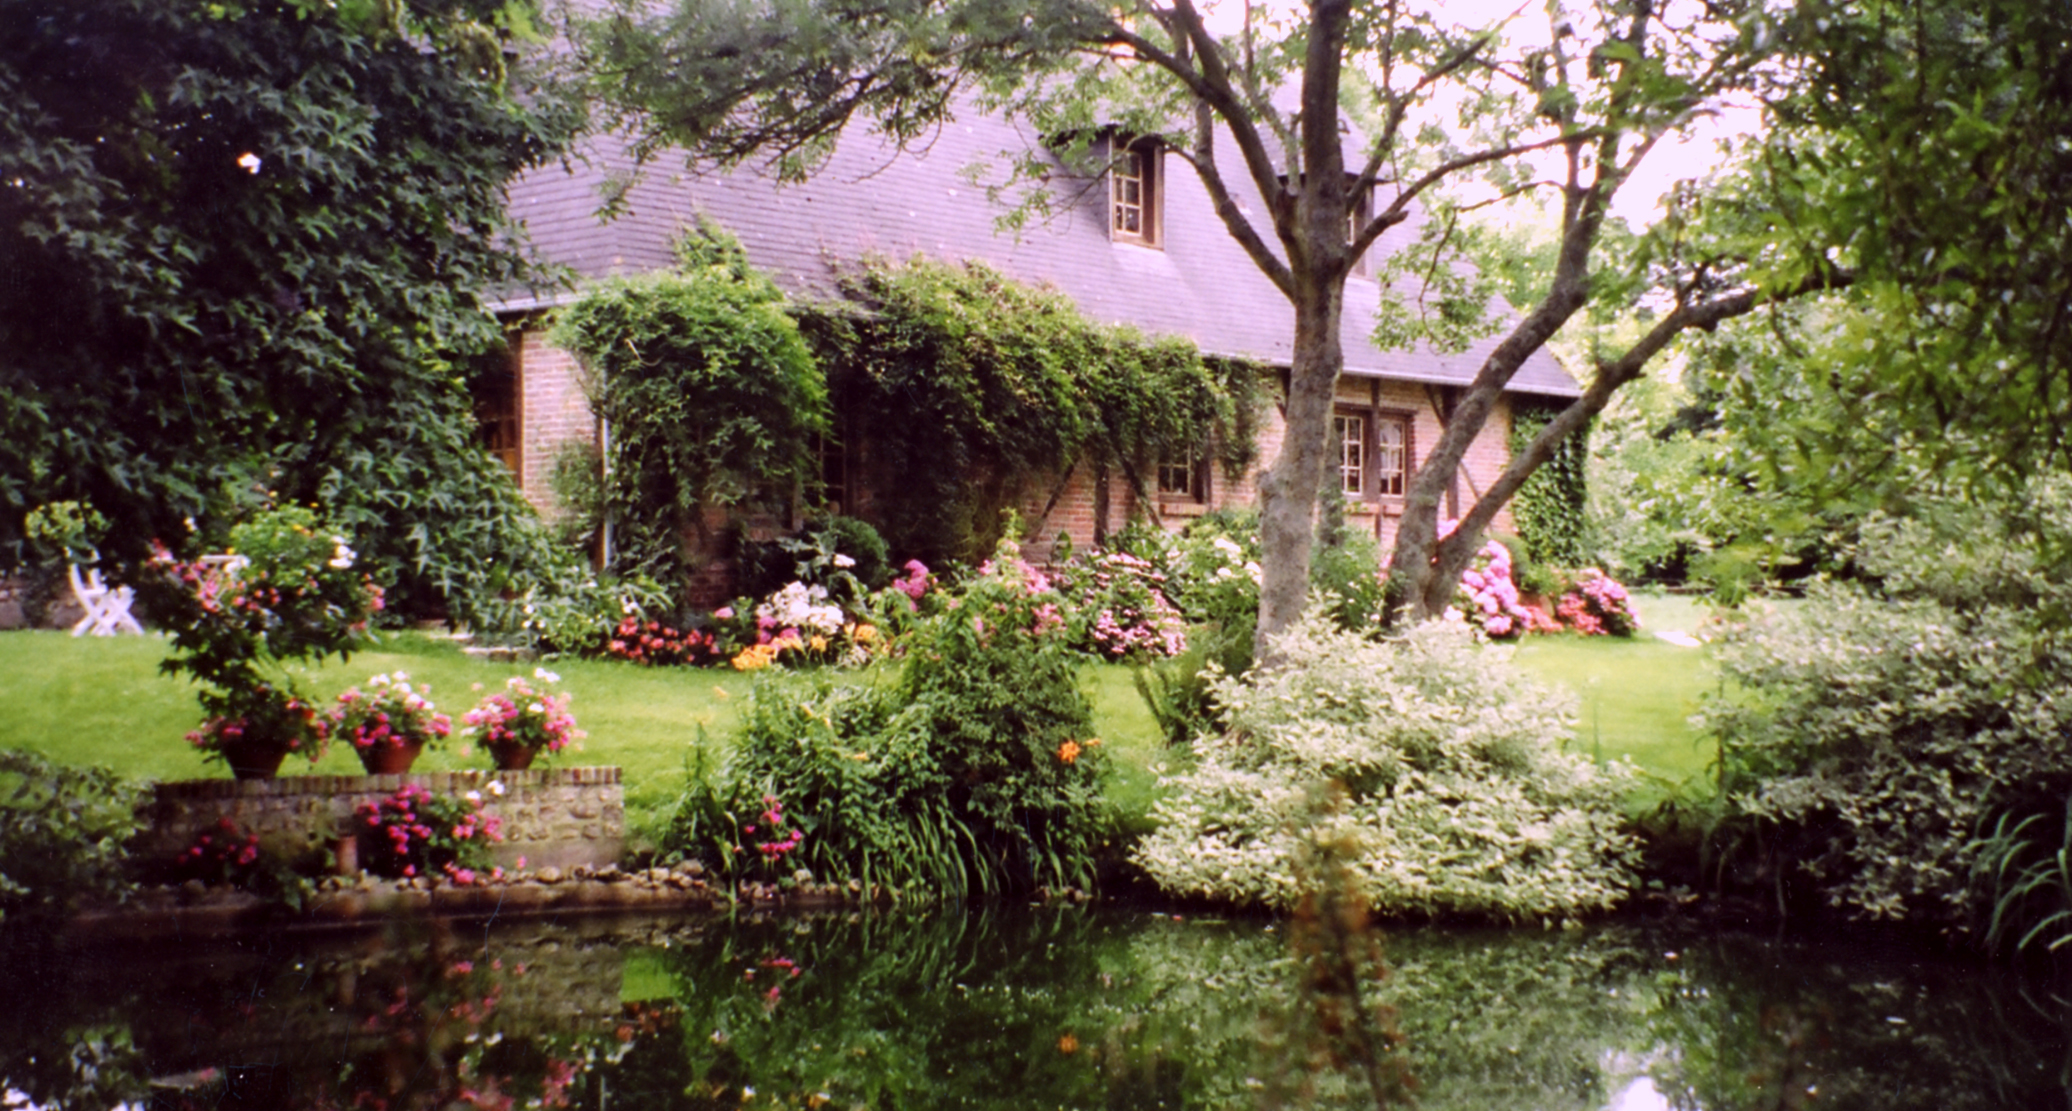 Gite avec jardin en normandie for Jardin 76